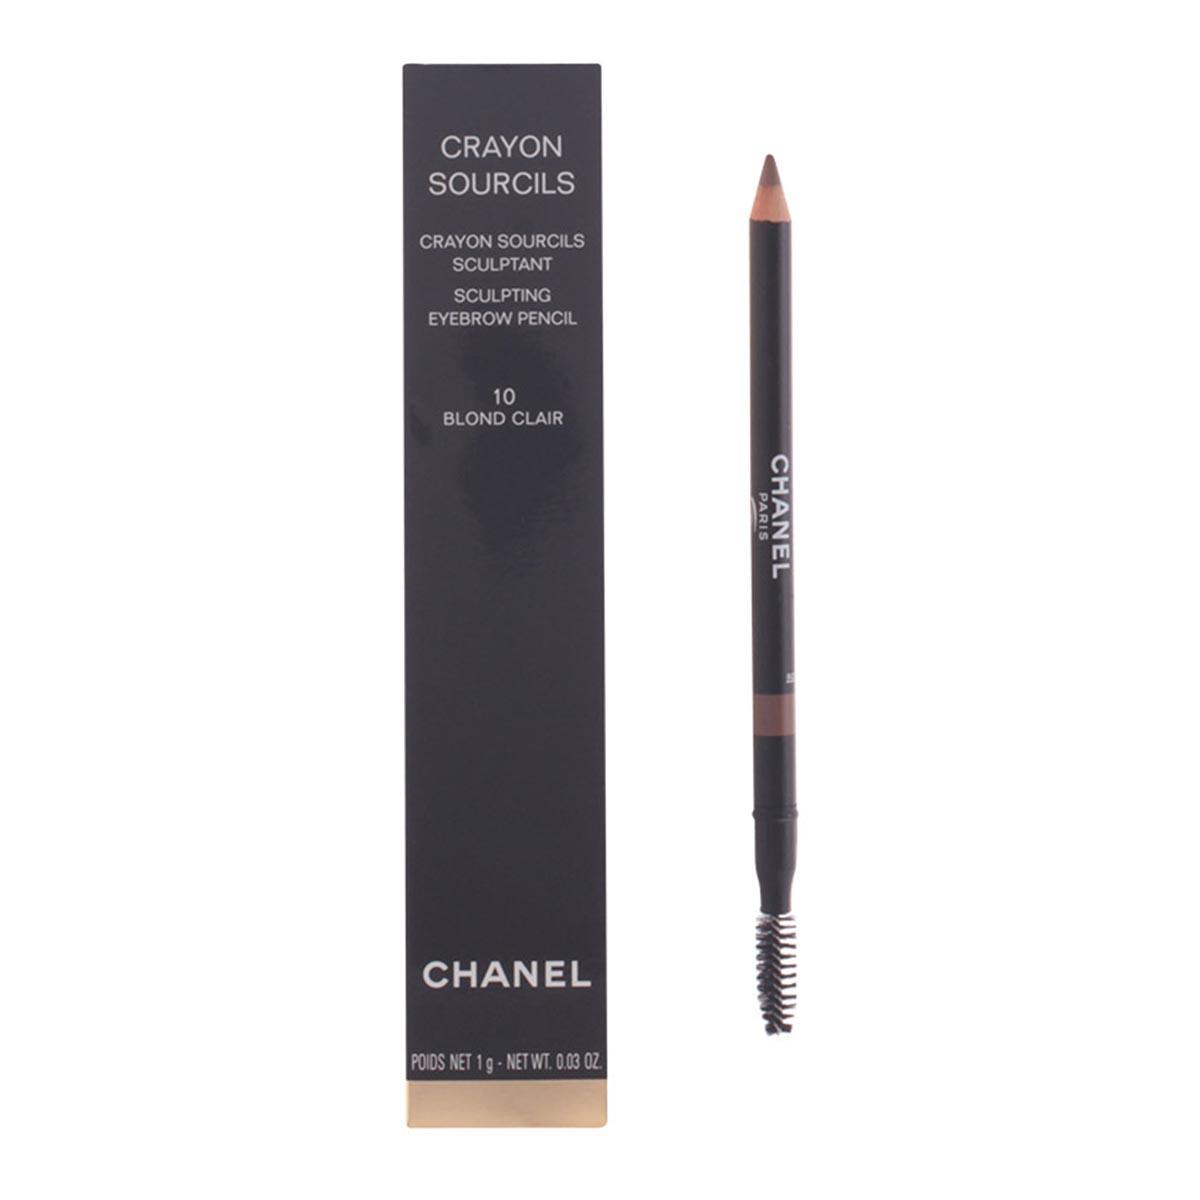 Chanel sculpting eyebrow pencil 10 blond clair